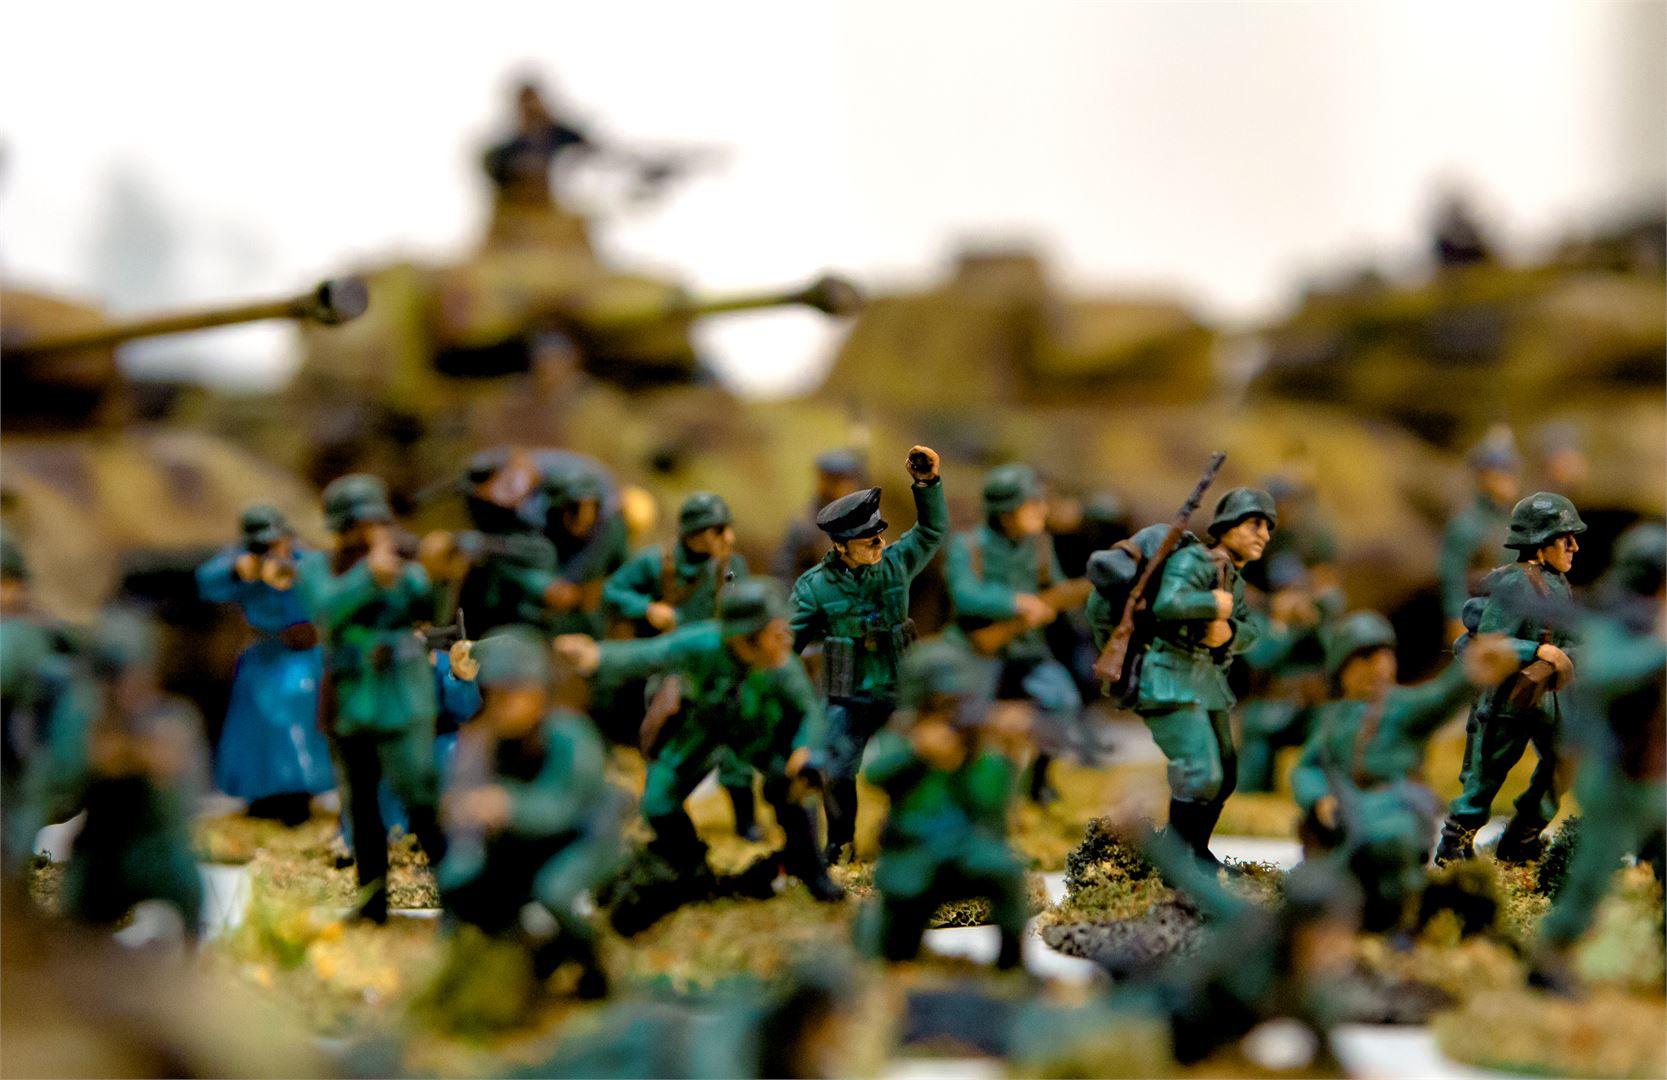 Saksalaissotilaita ajoneuvoineen.